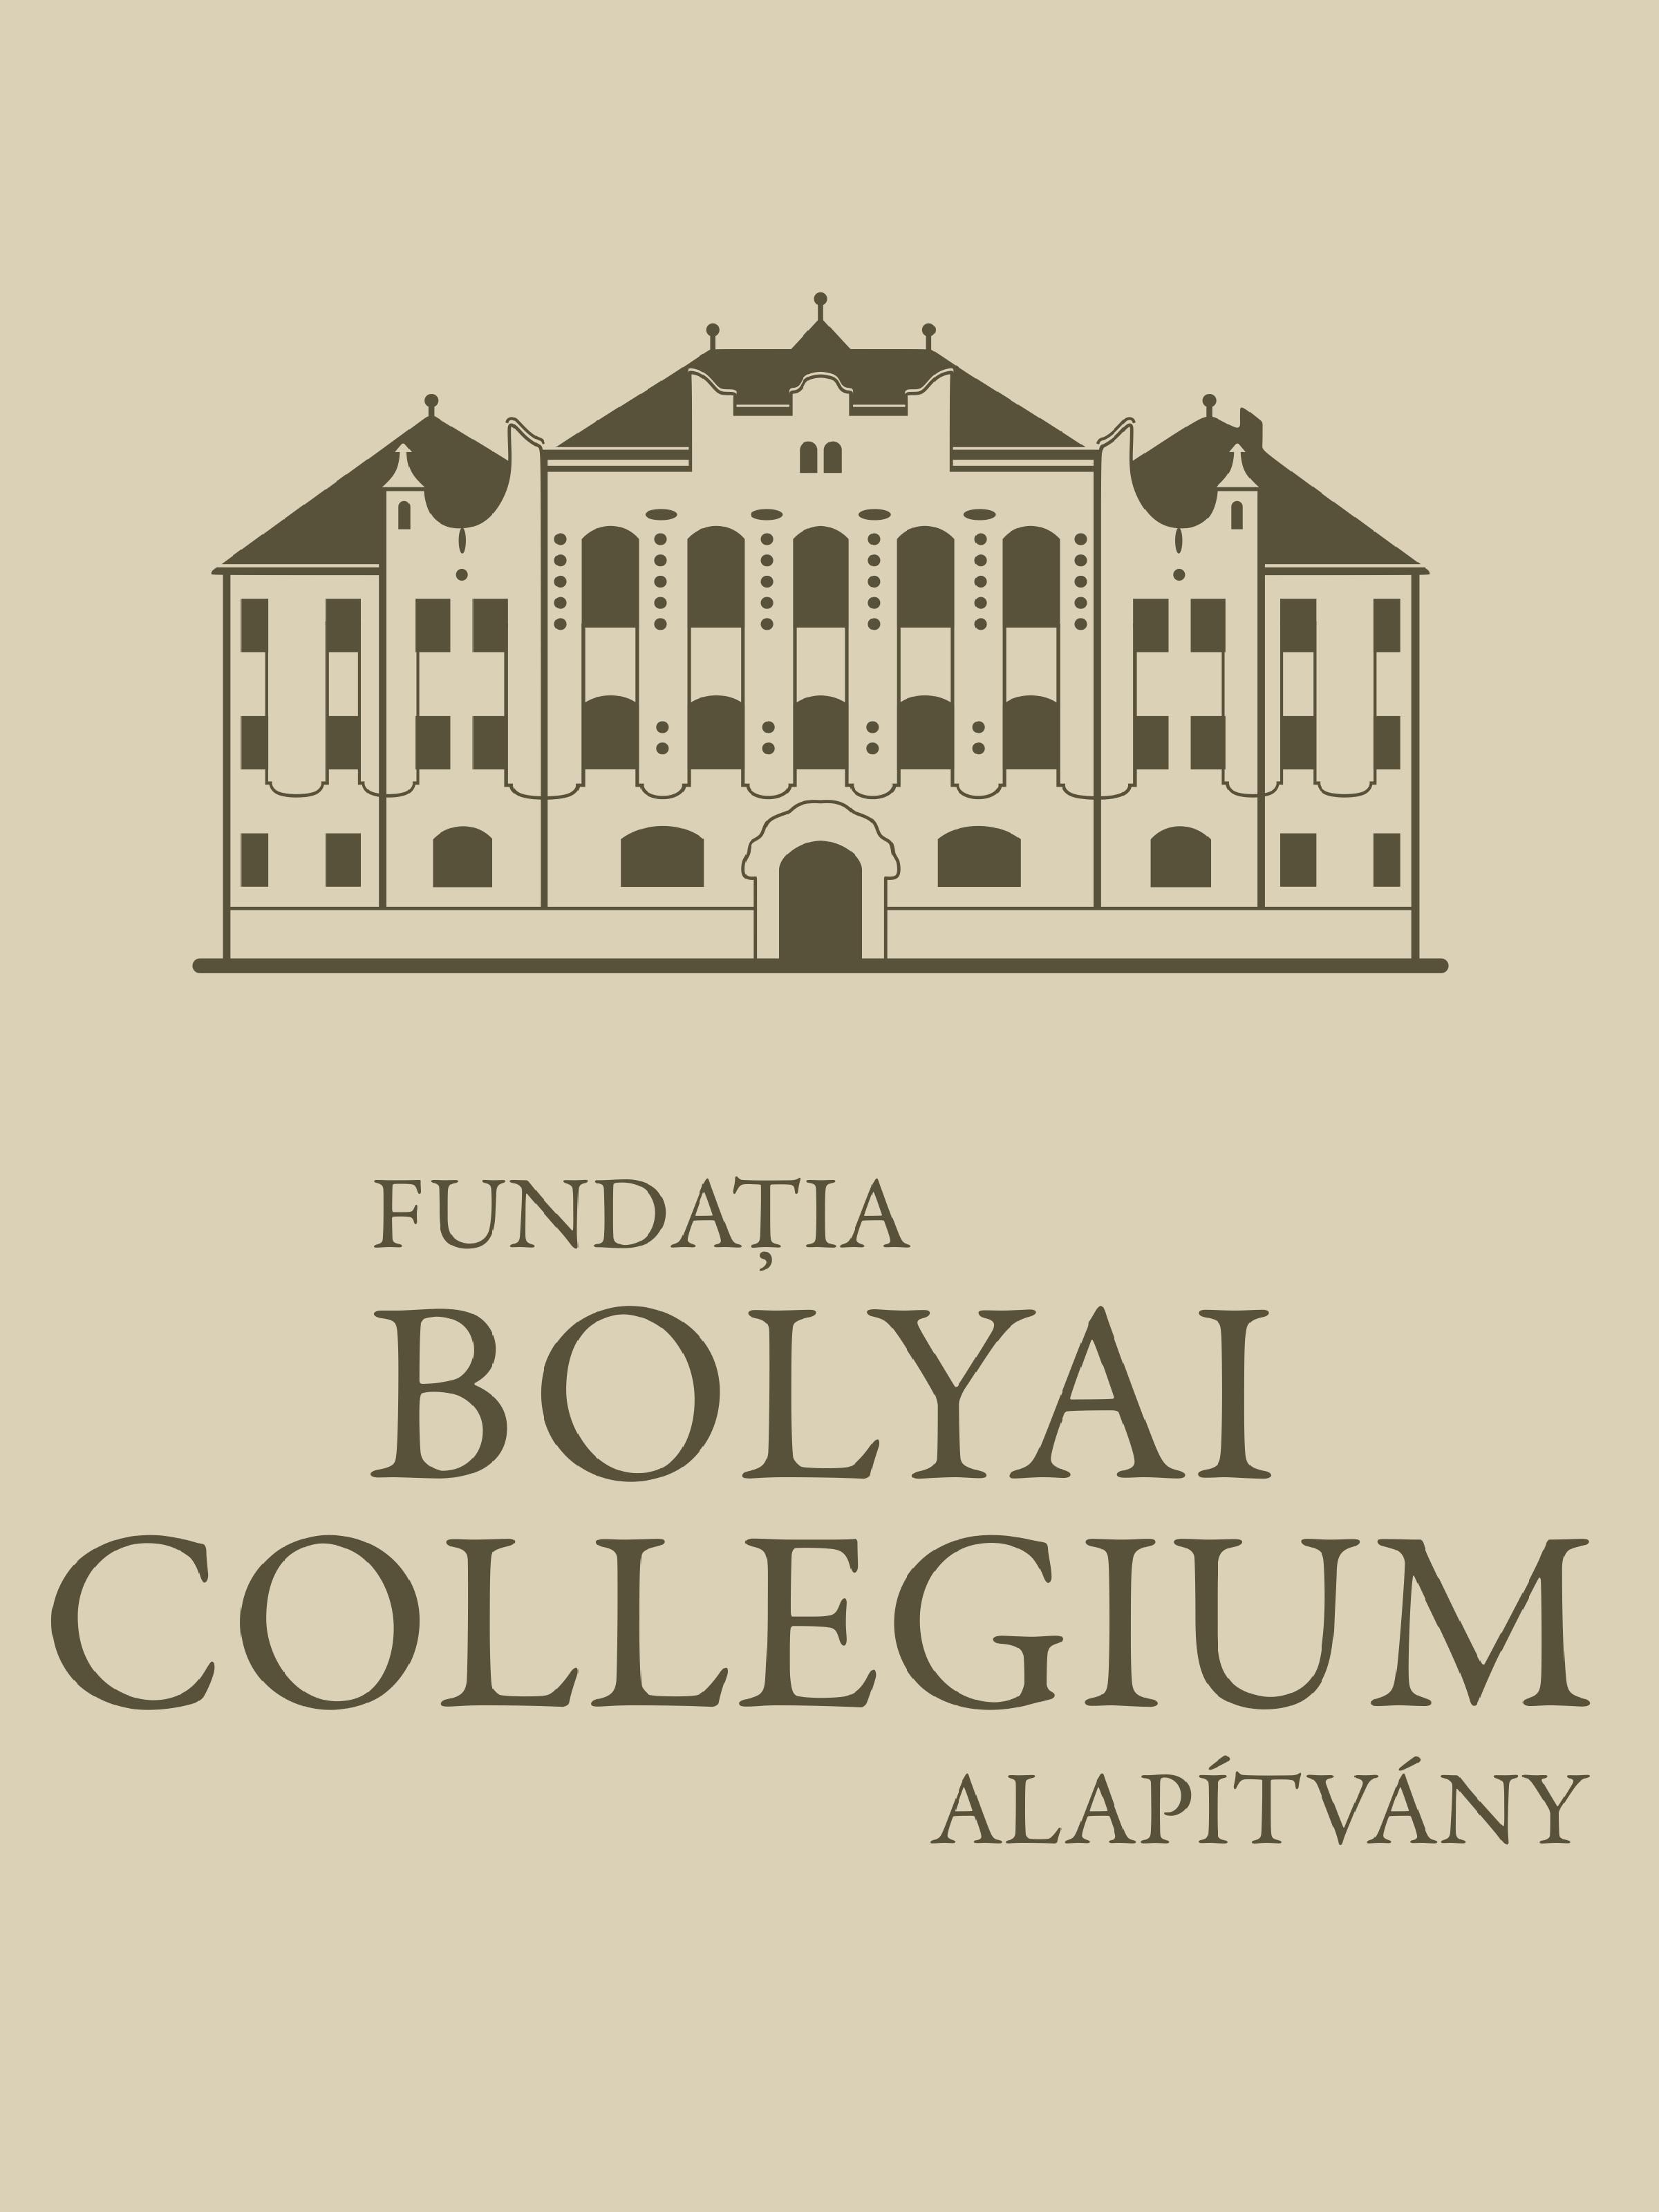 Fundația Bolyai Collegium logo